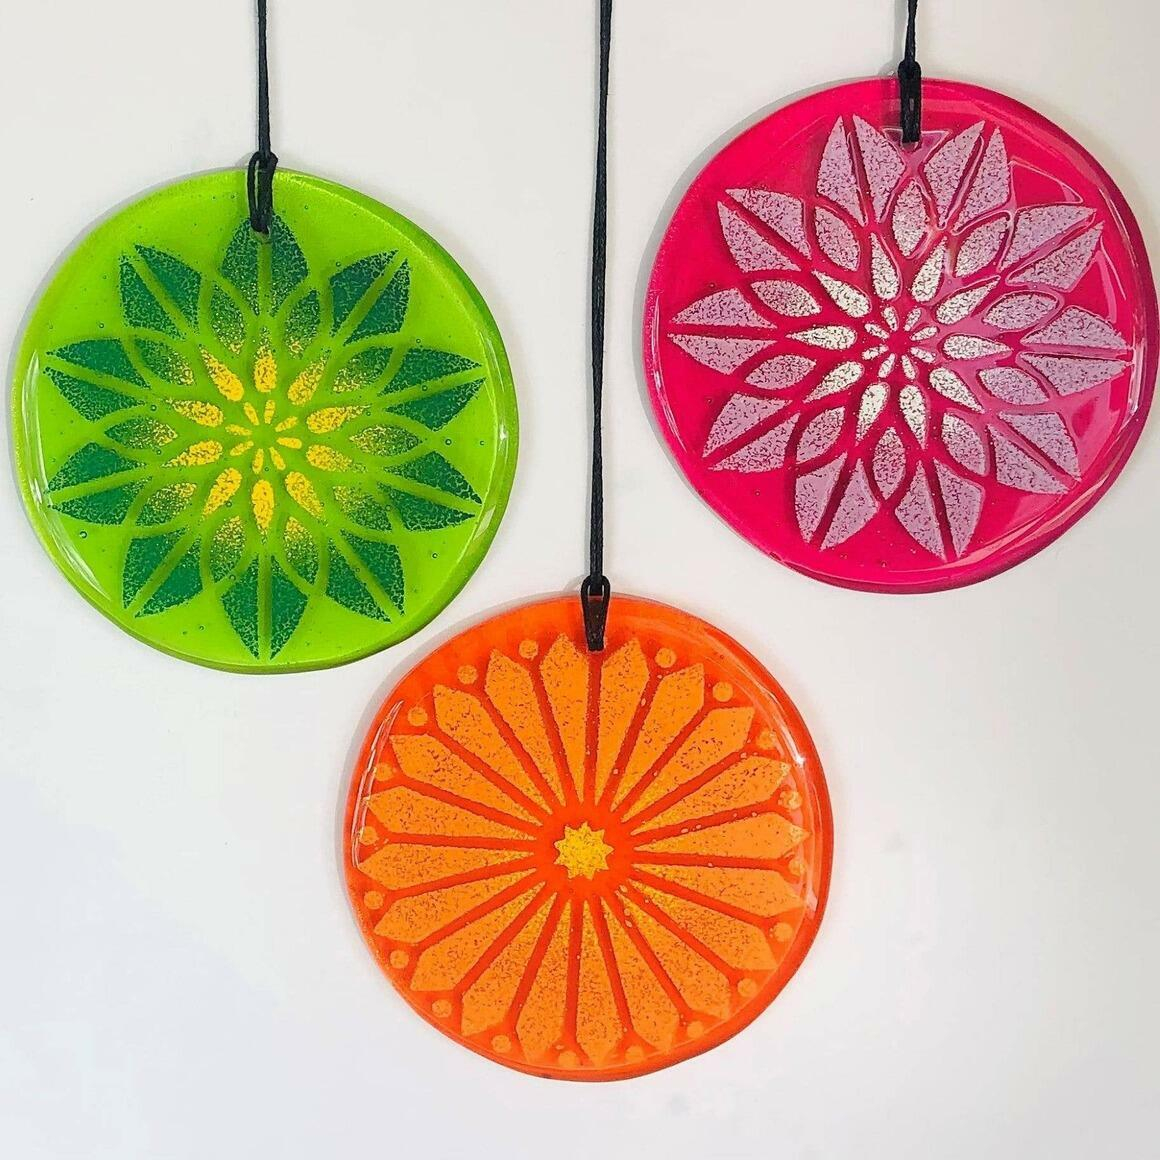 Glass Mandala Window Ornament Suncatcher - Variety Starter Set | Trada Marketplace